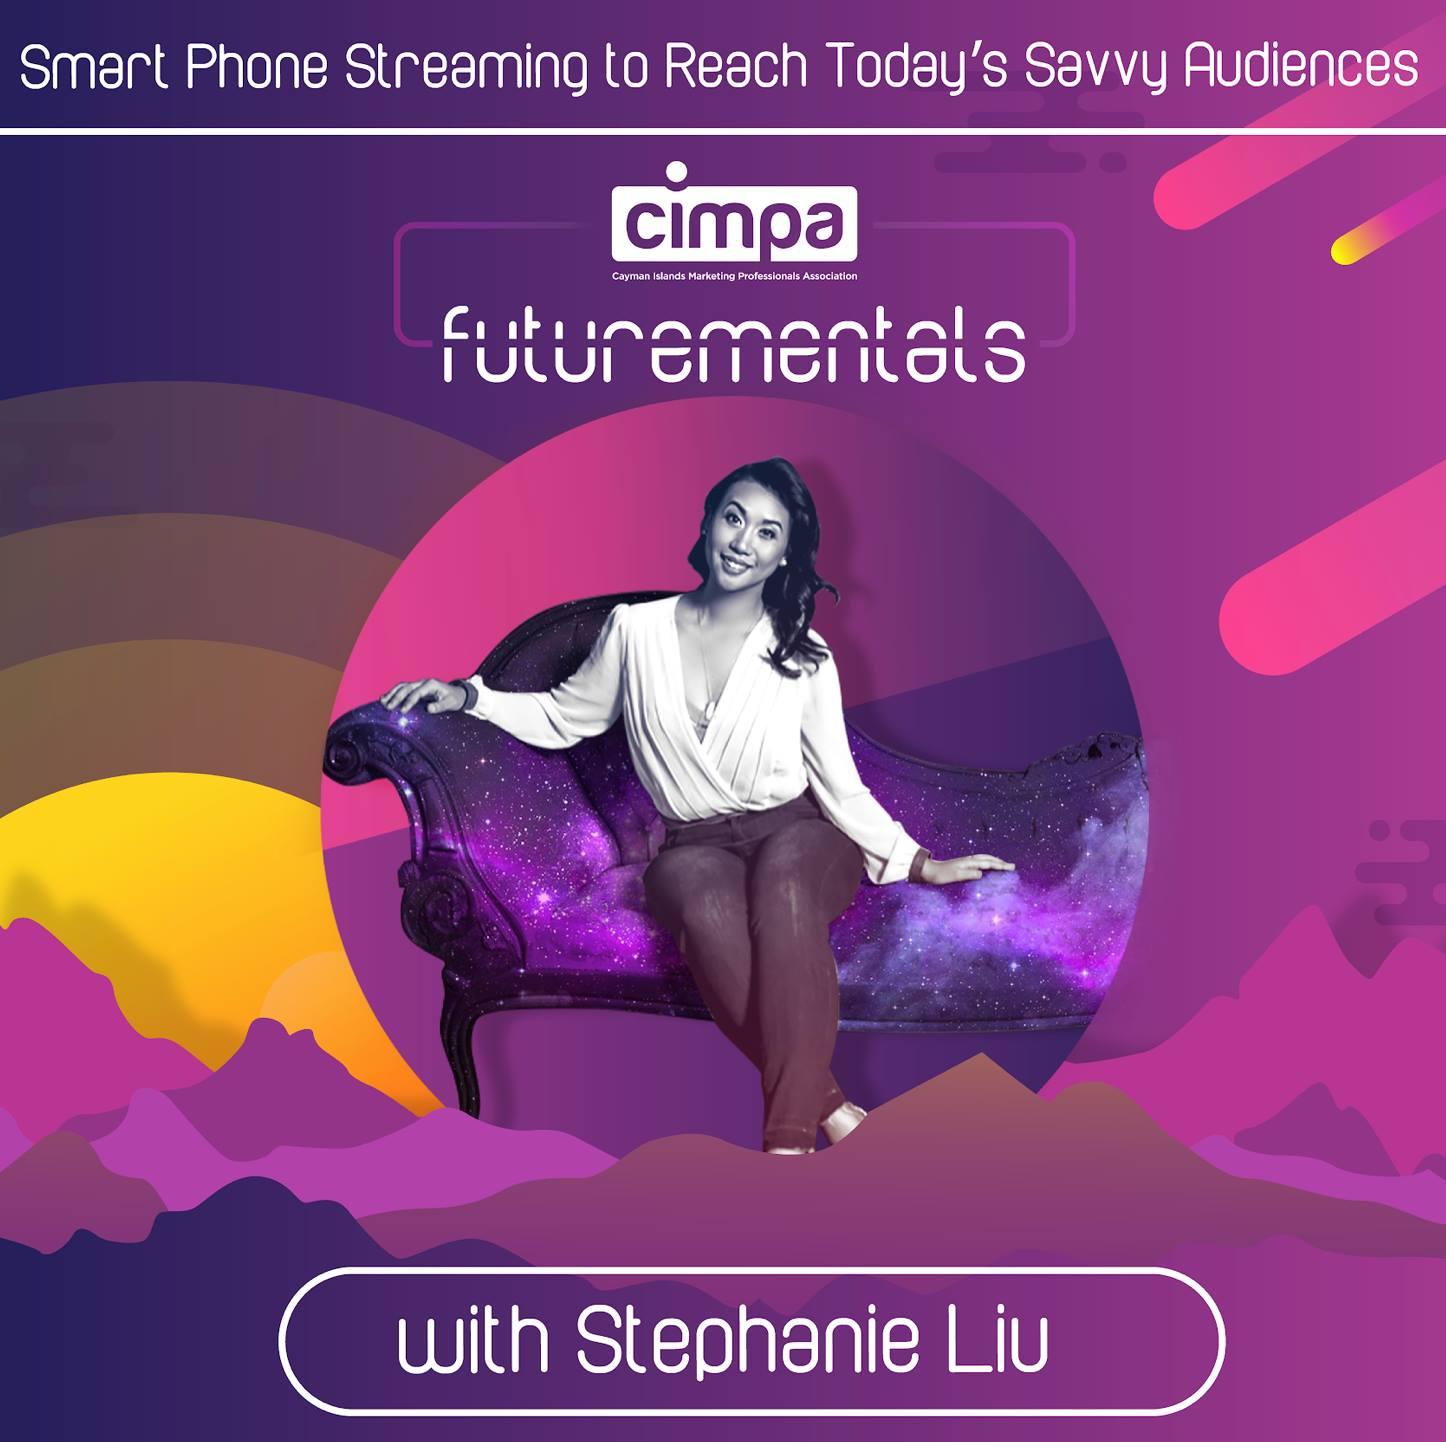 Facebook Live Stephanie Liu CIMPA.jpg